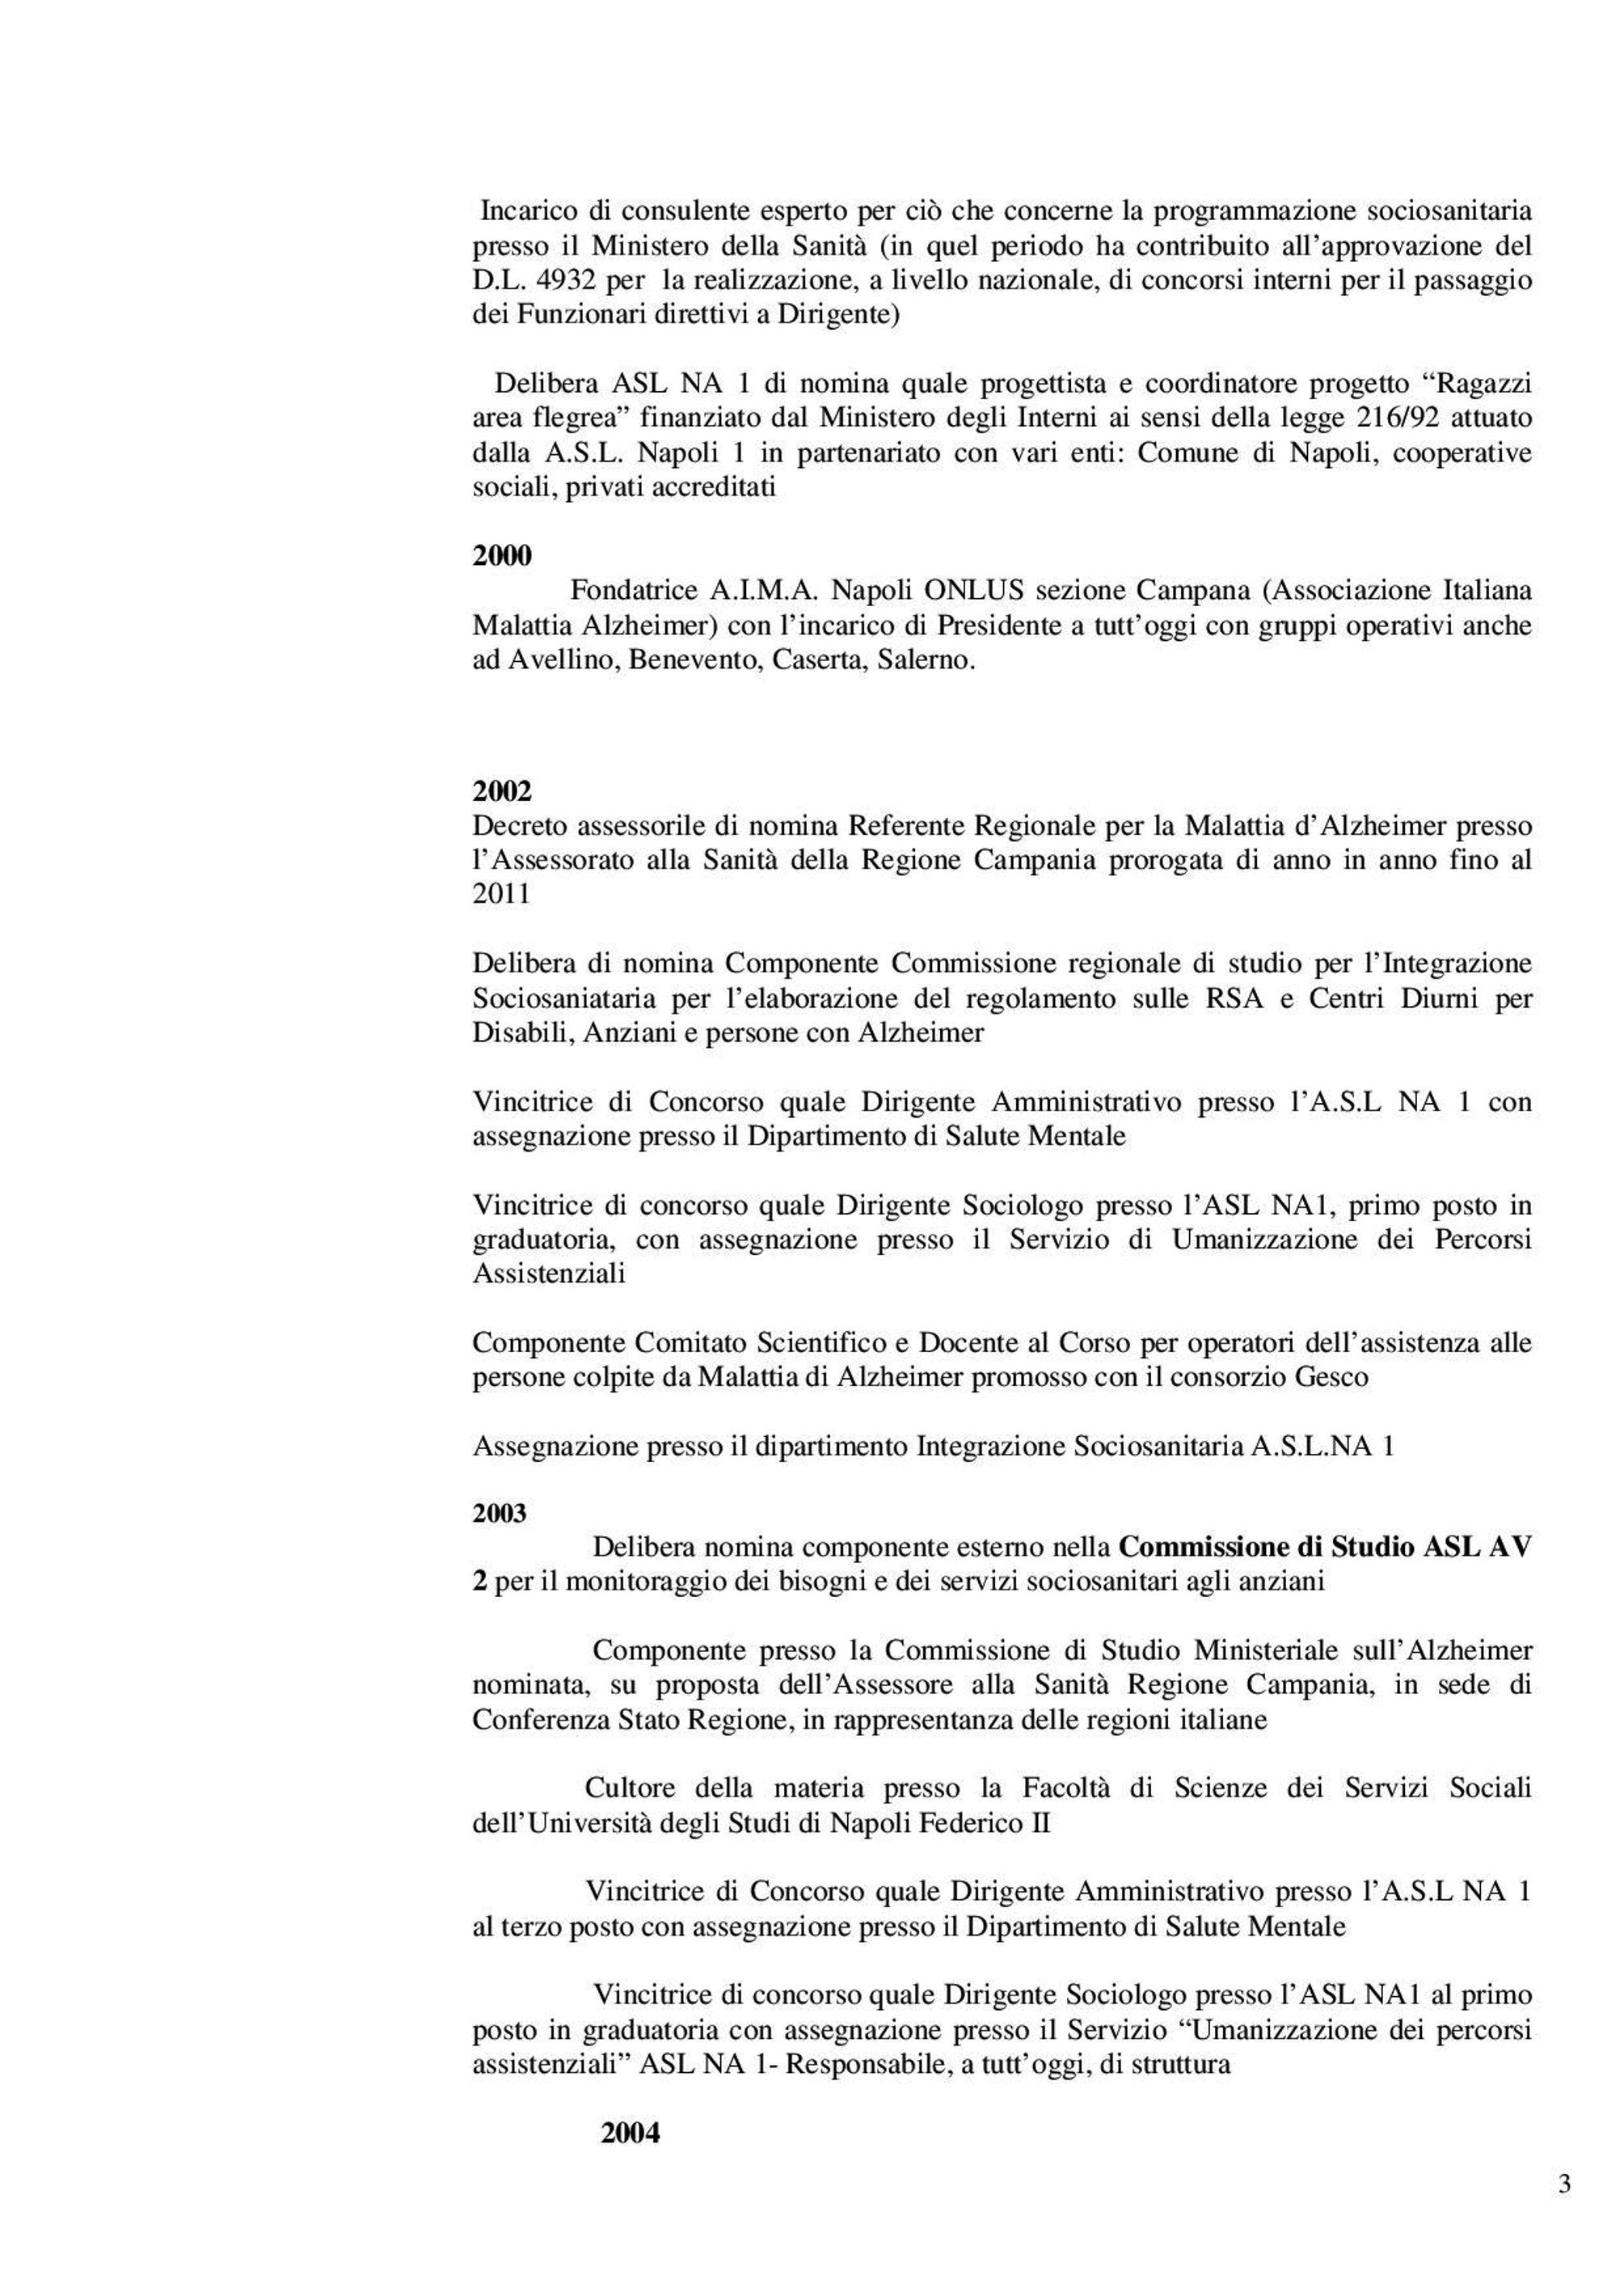 CUURICULUM MUSELLA FORMATO EUROPEO-page-003